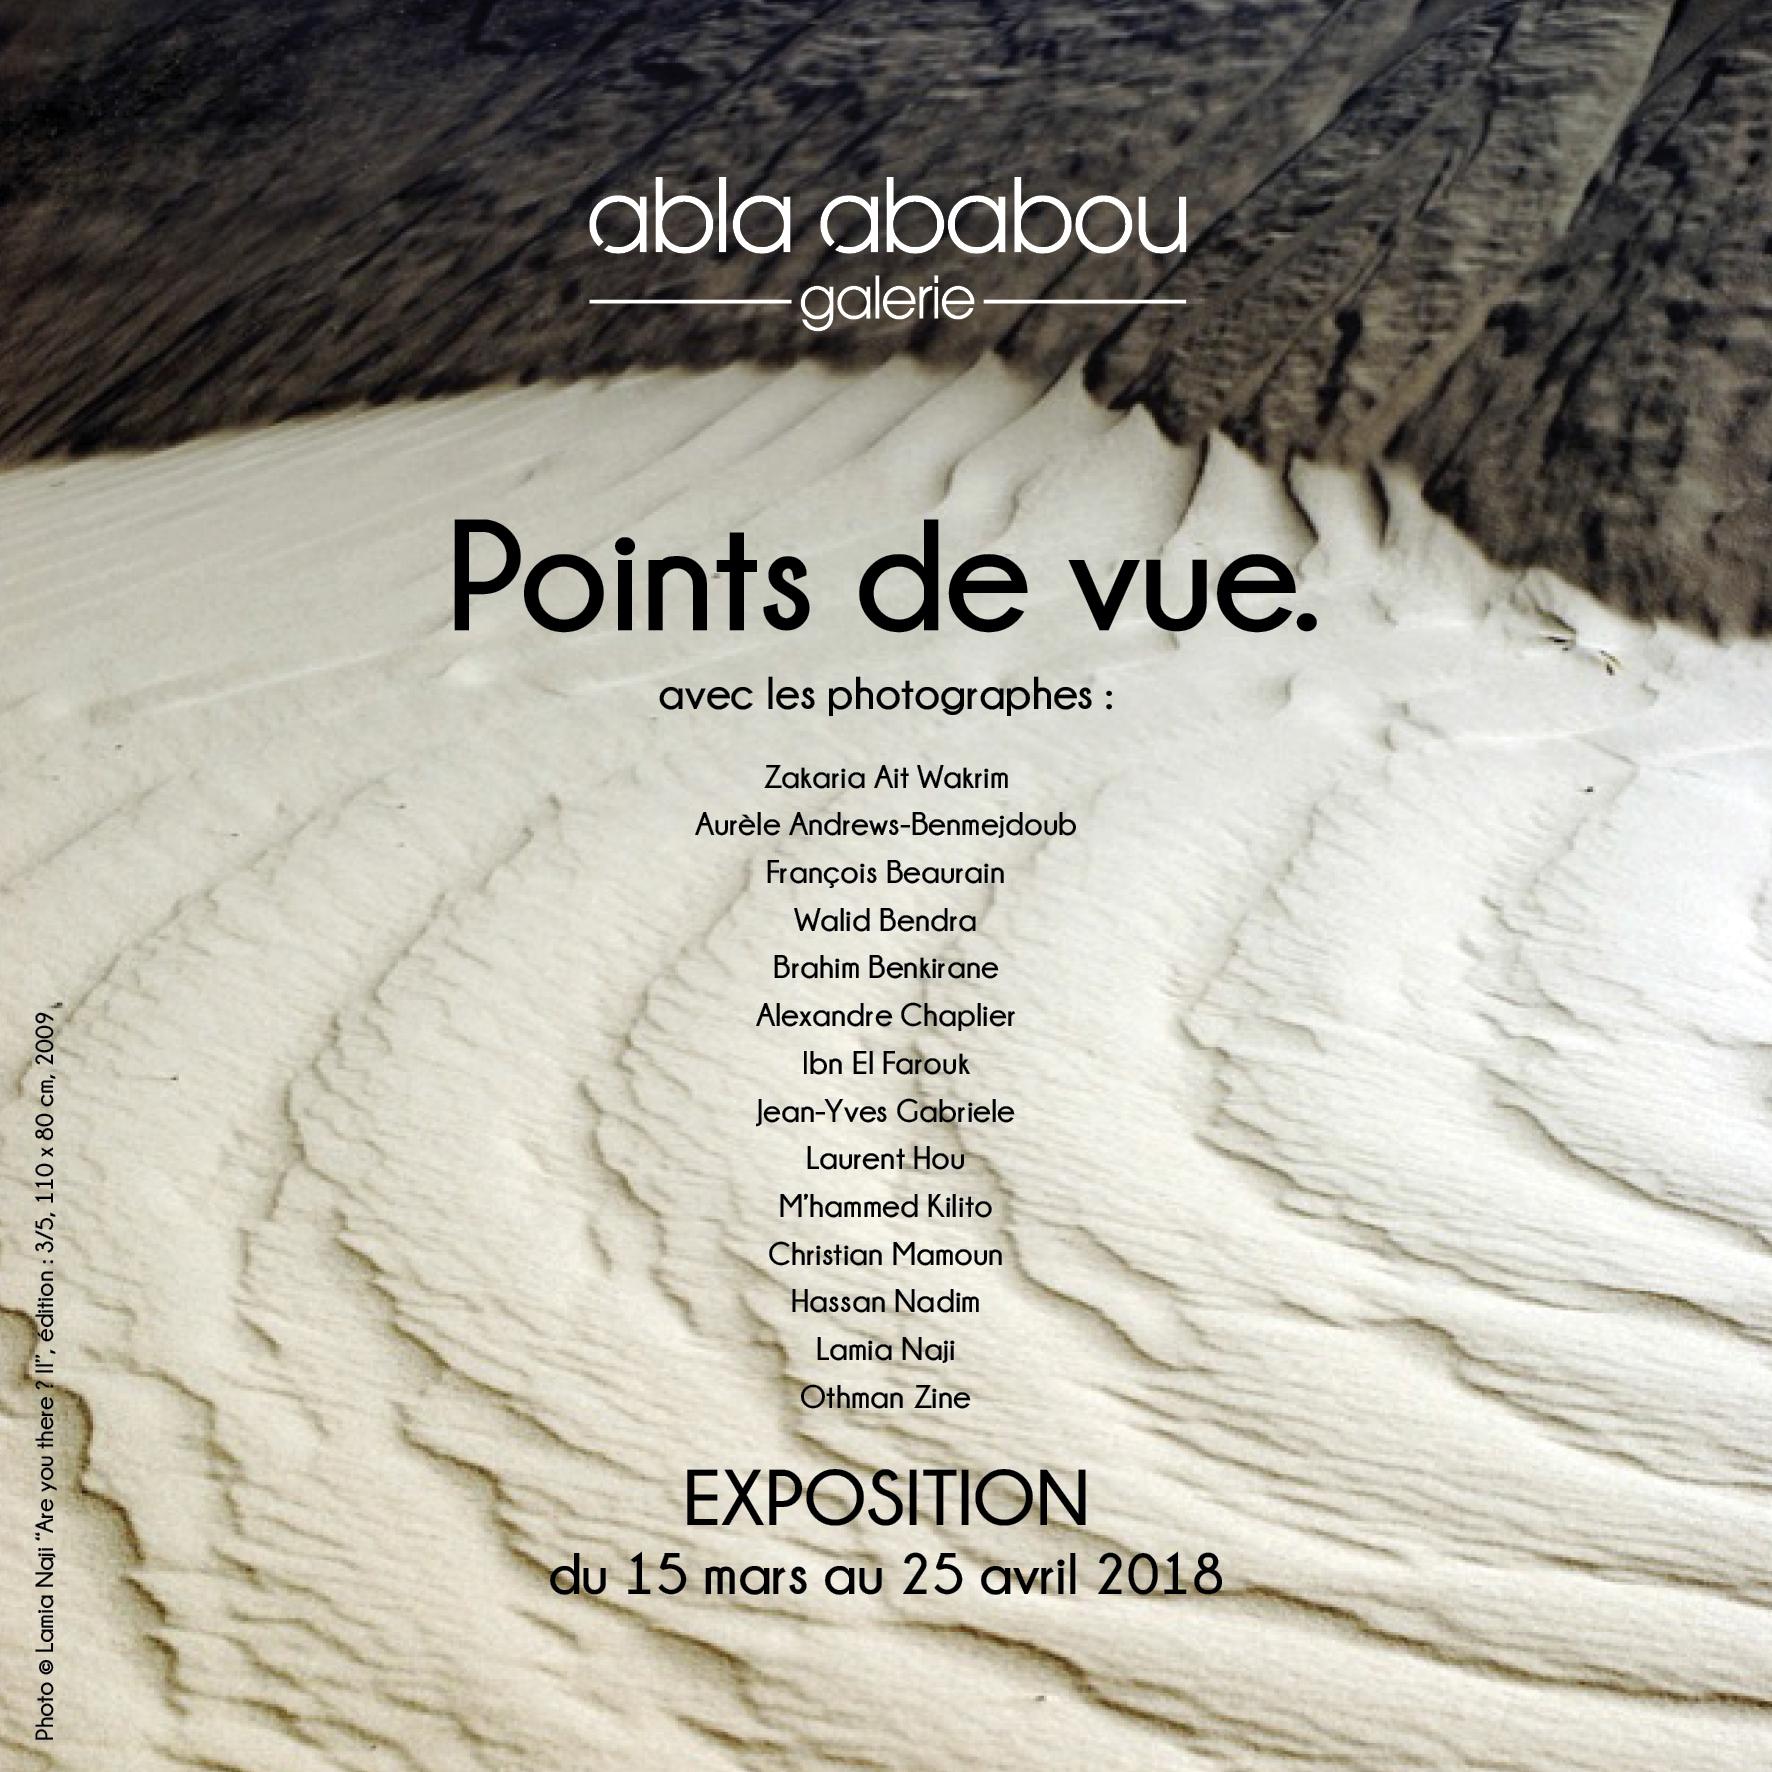 Invitation-Expo-Points-de-vue.jpg